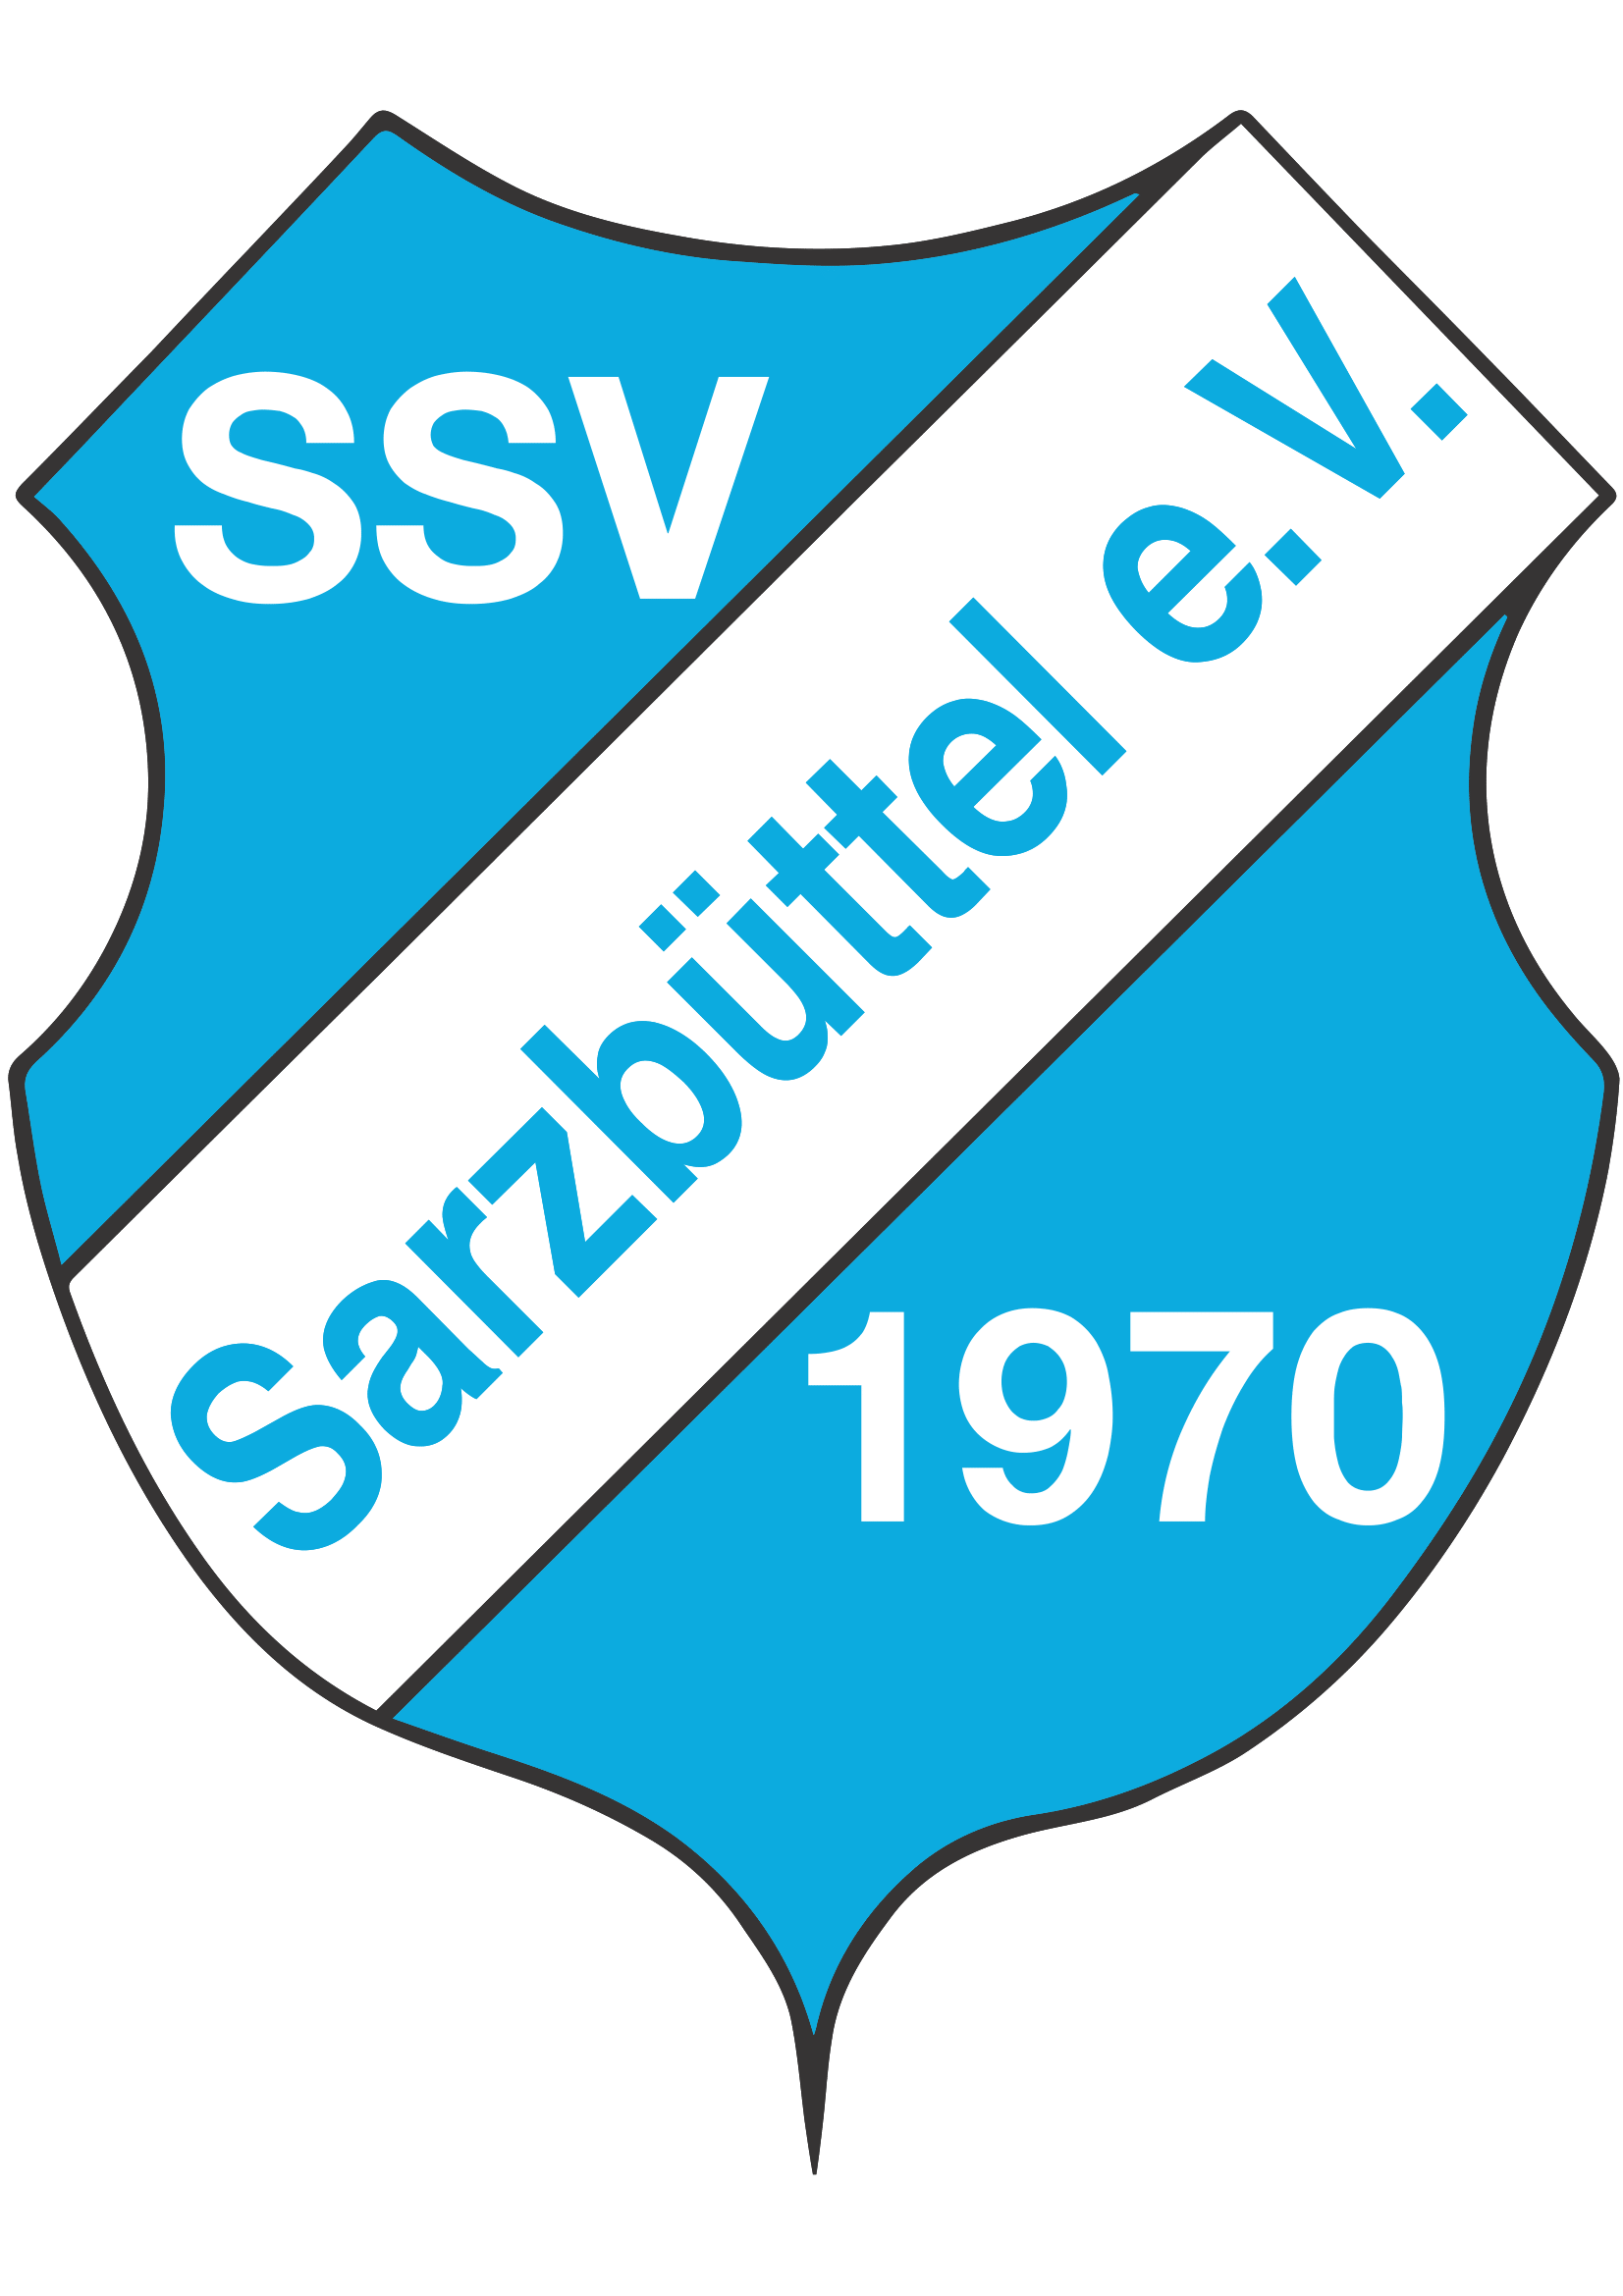 SSV Sarzbüttel 1970 e.V.